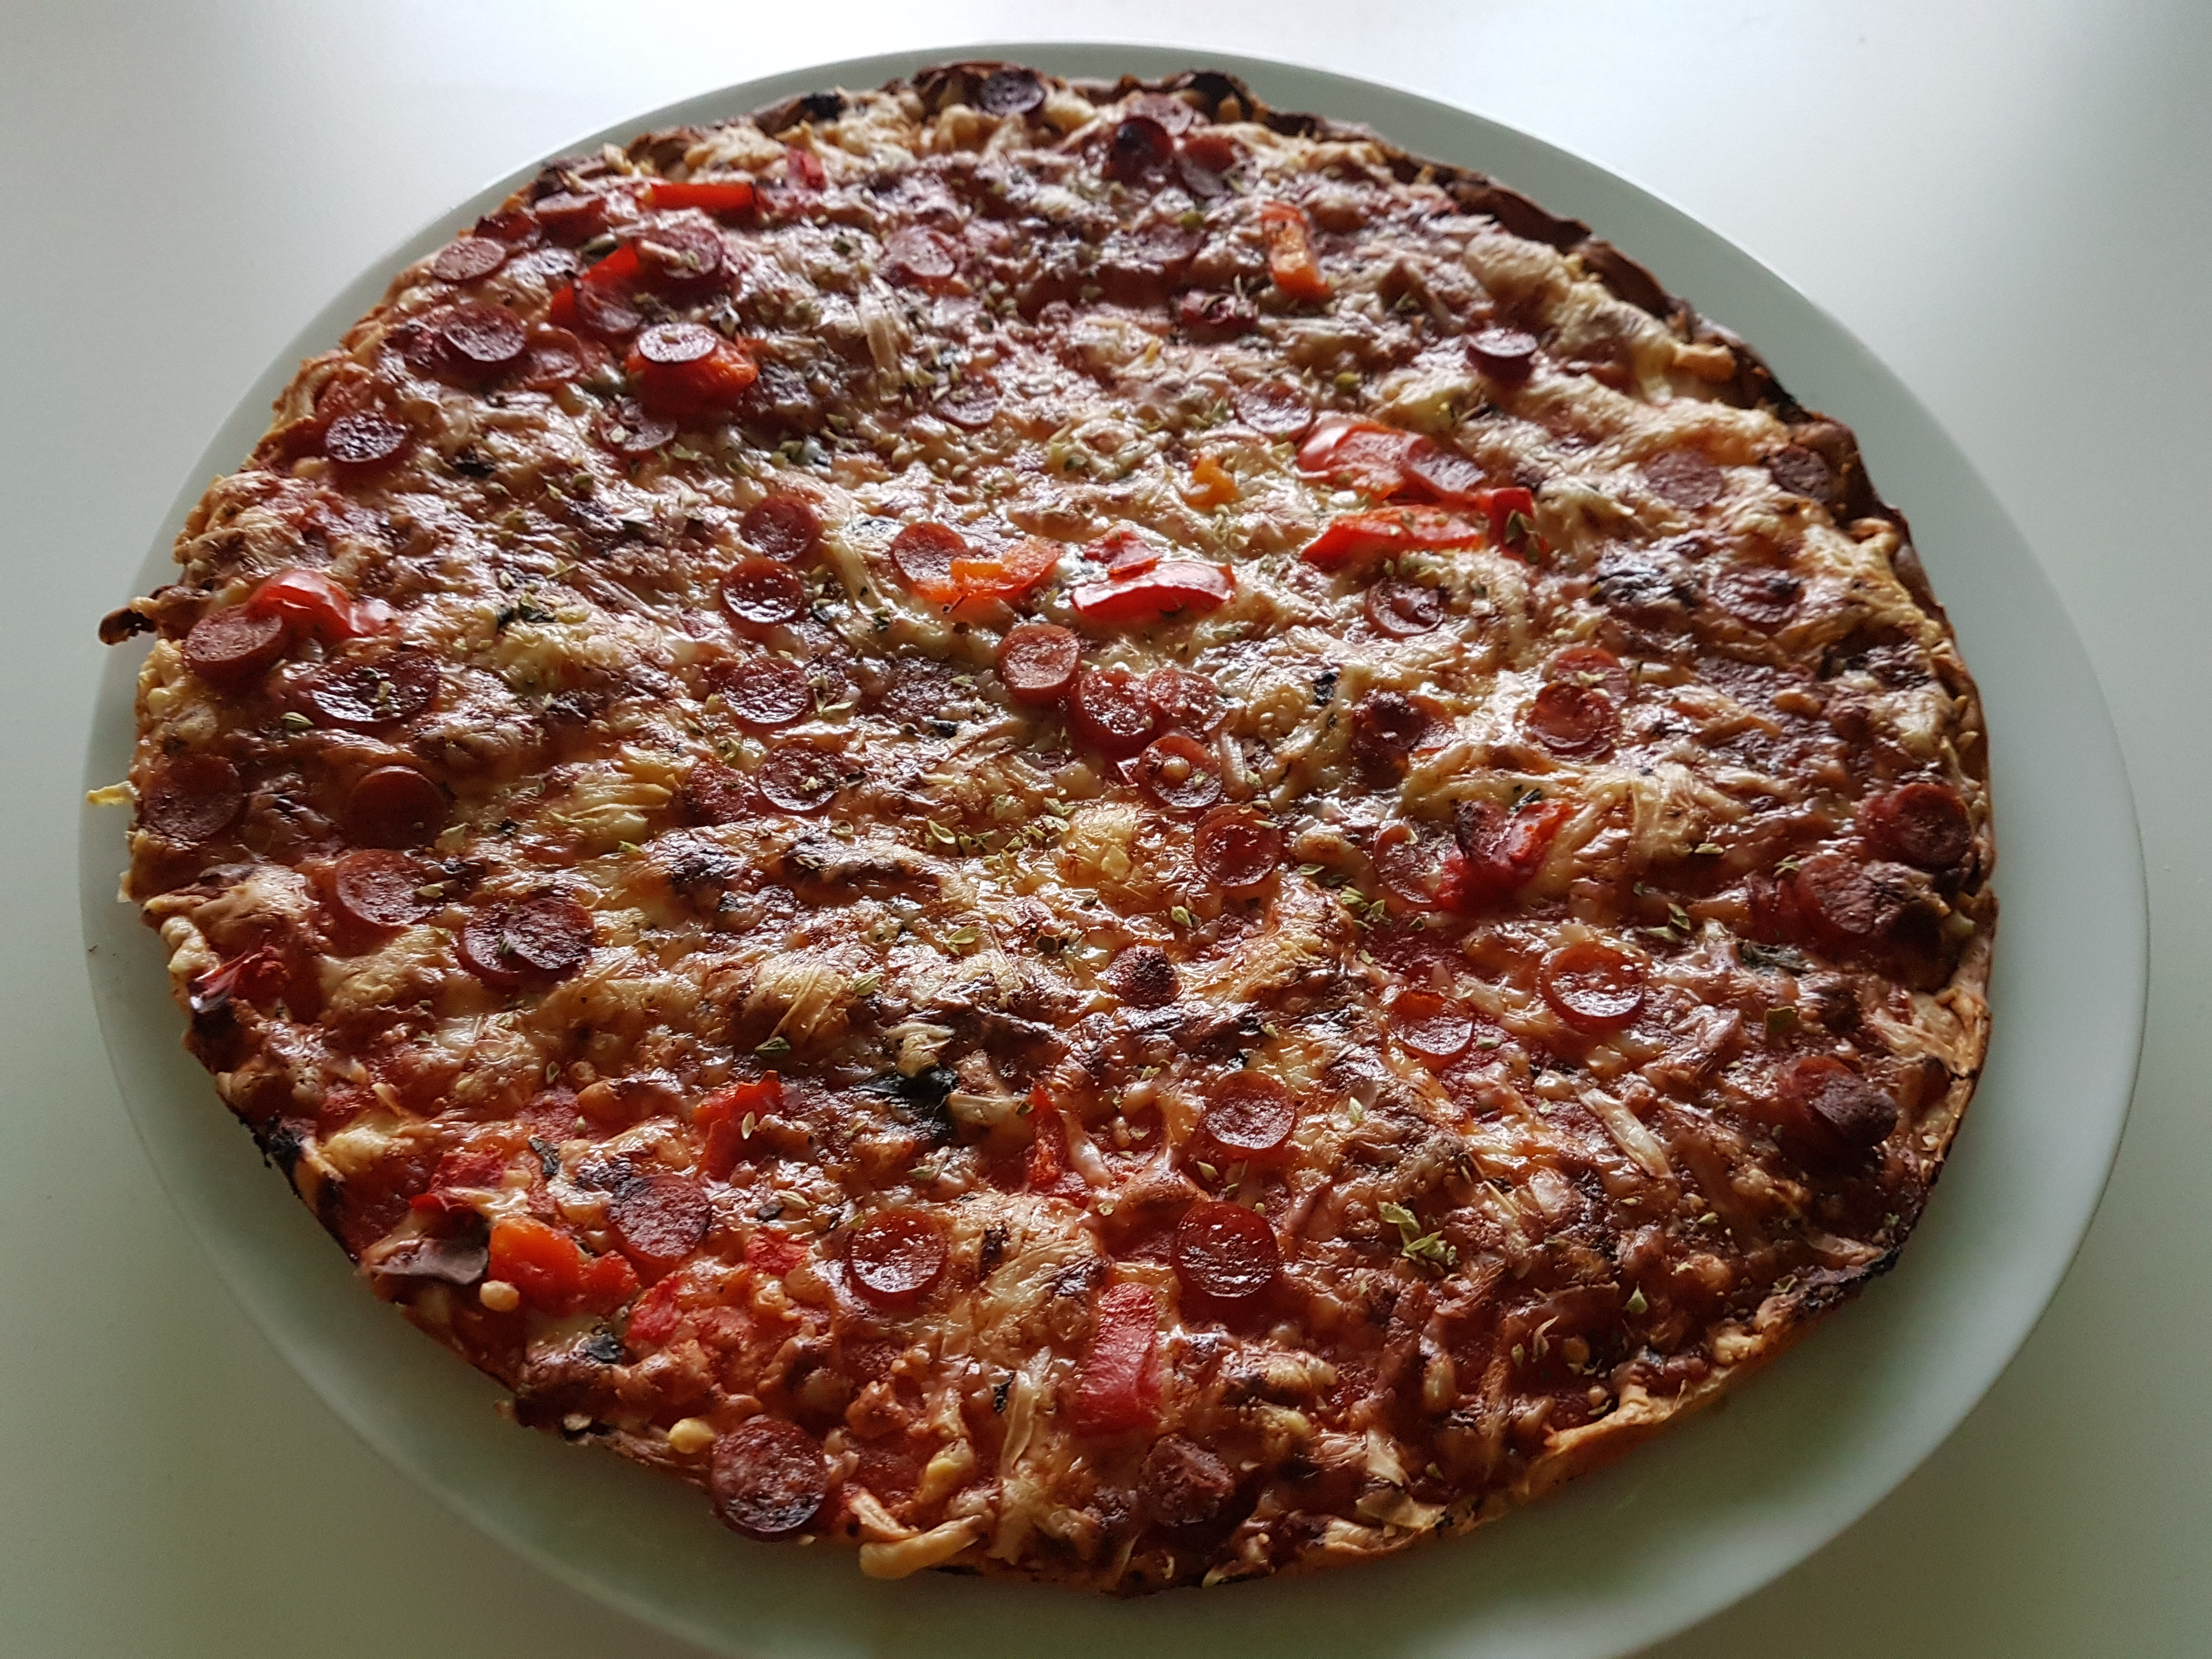 http://foodloader.net/Holz_2017-08-30_Pizza.jpg